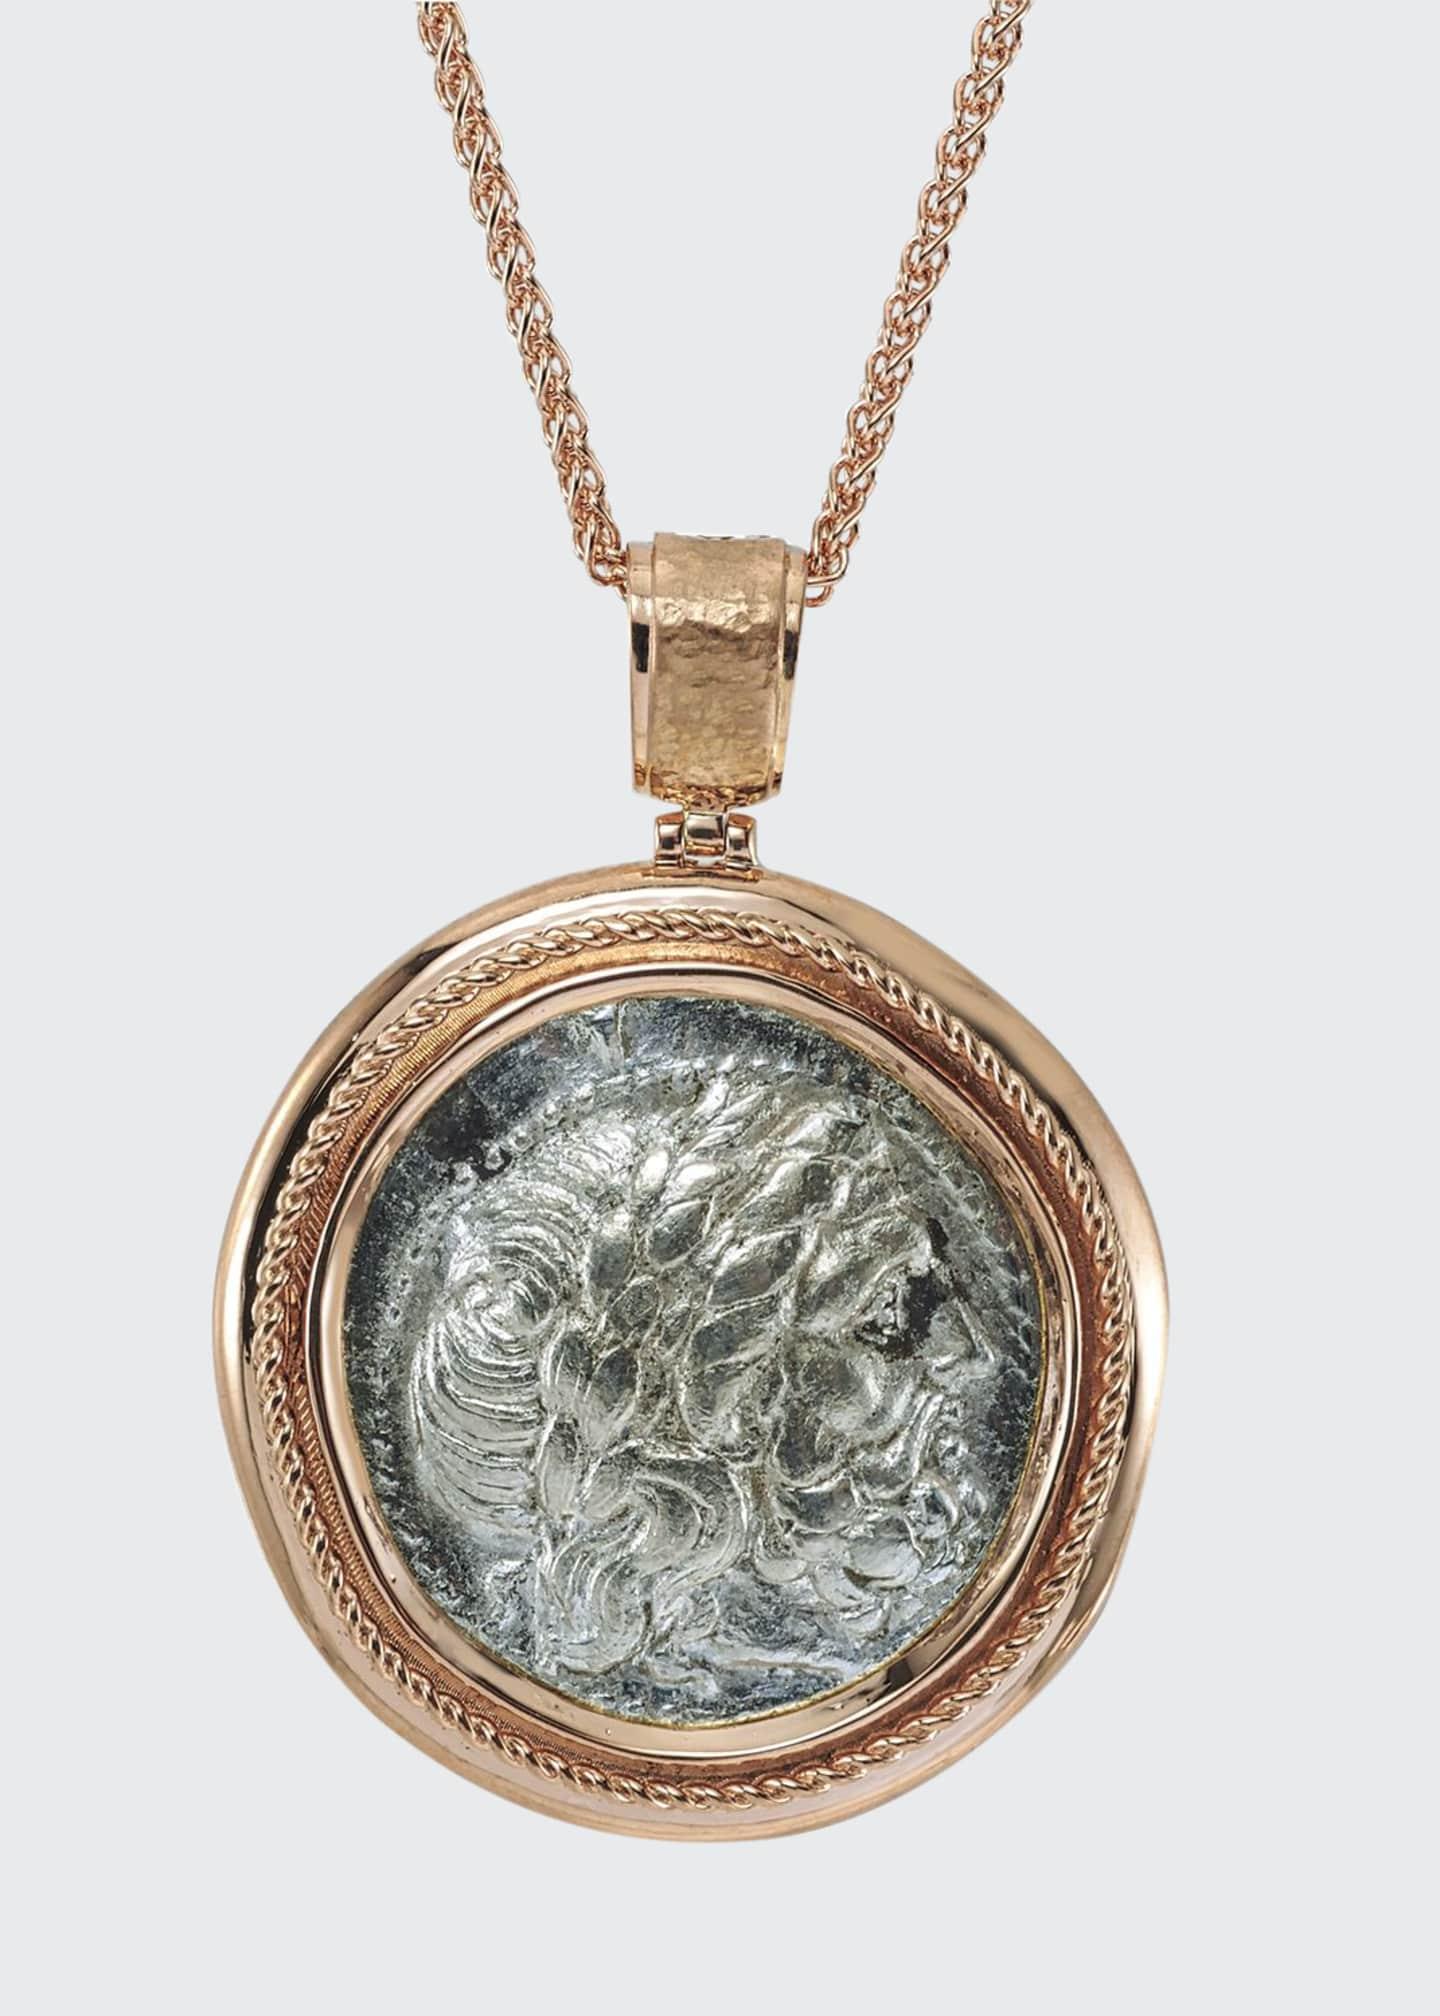 Jorge Adeler Authentic Philip II Coin Pendant in